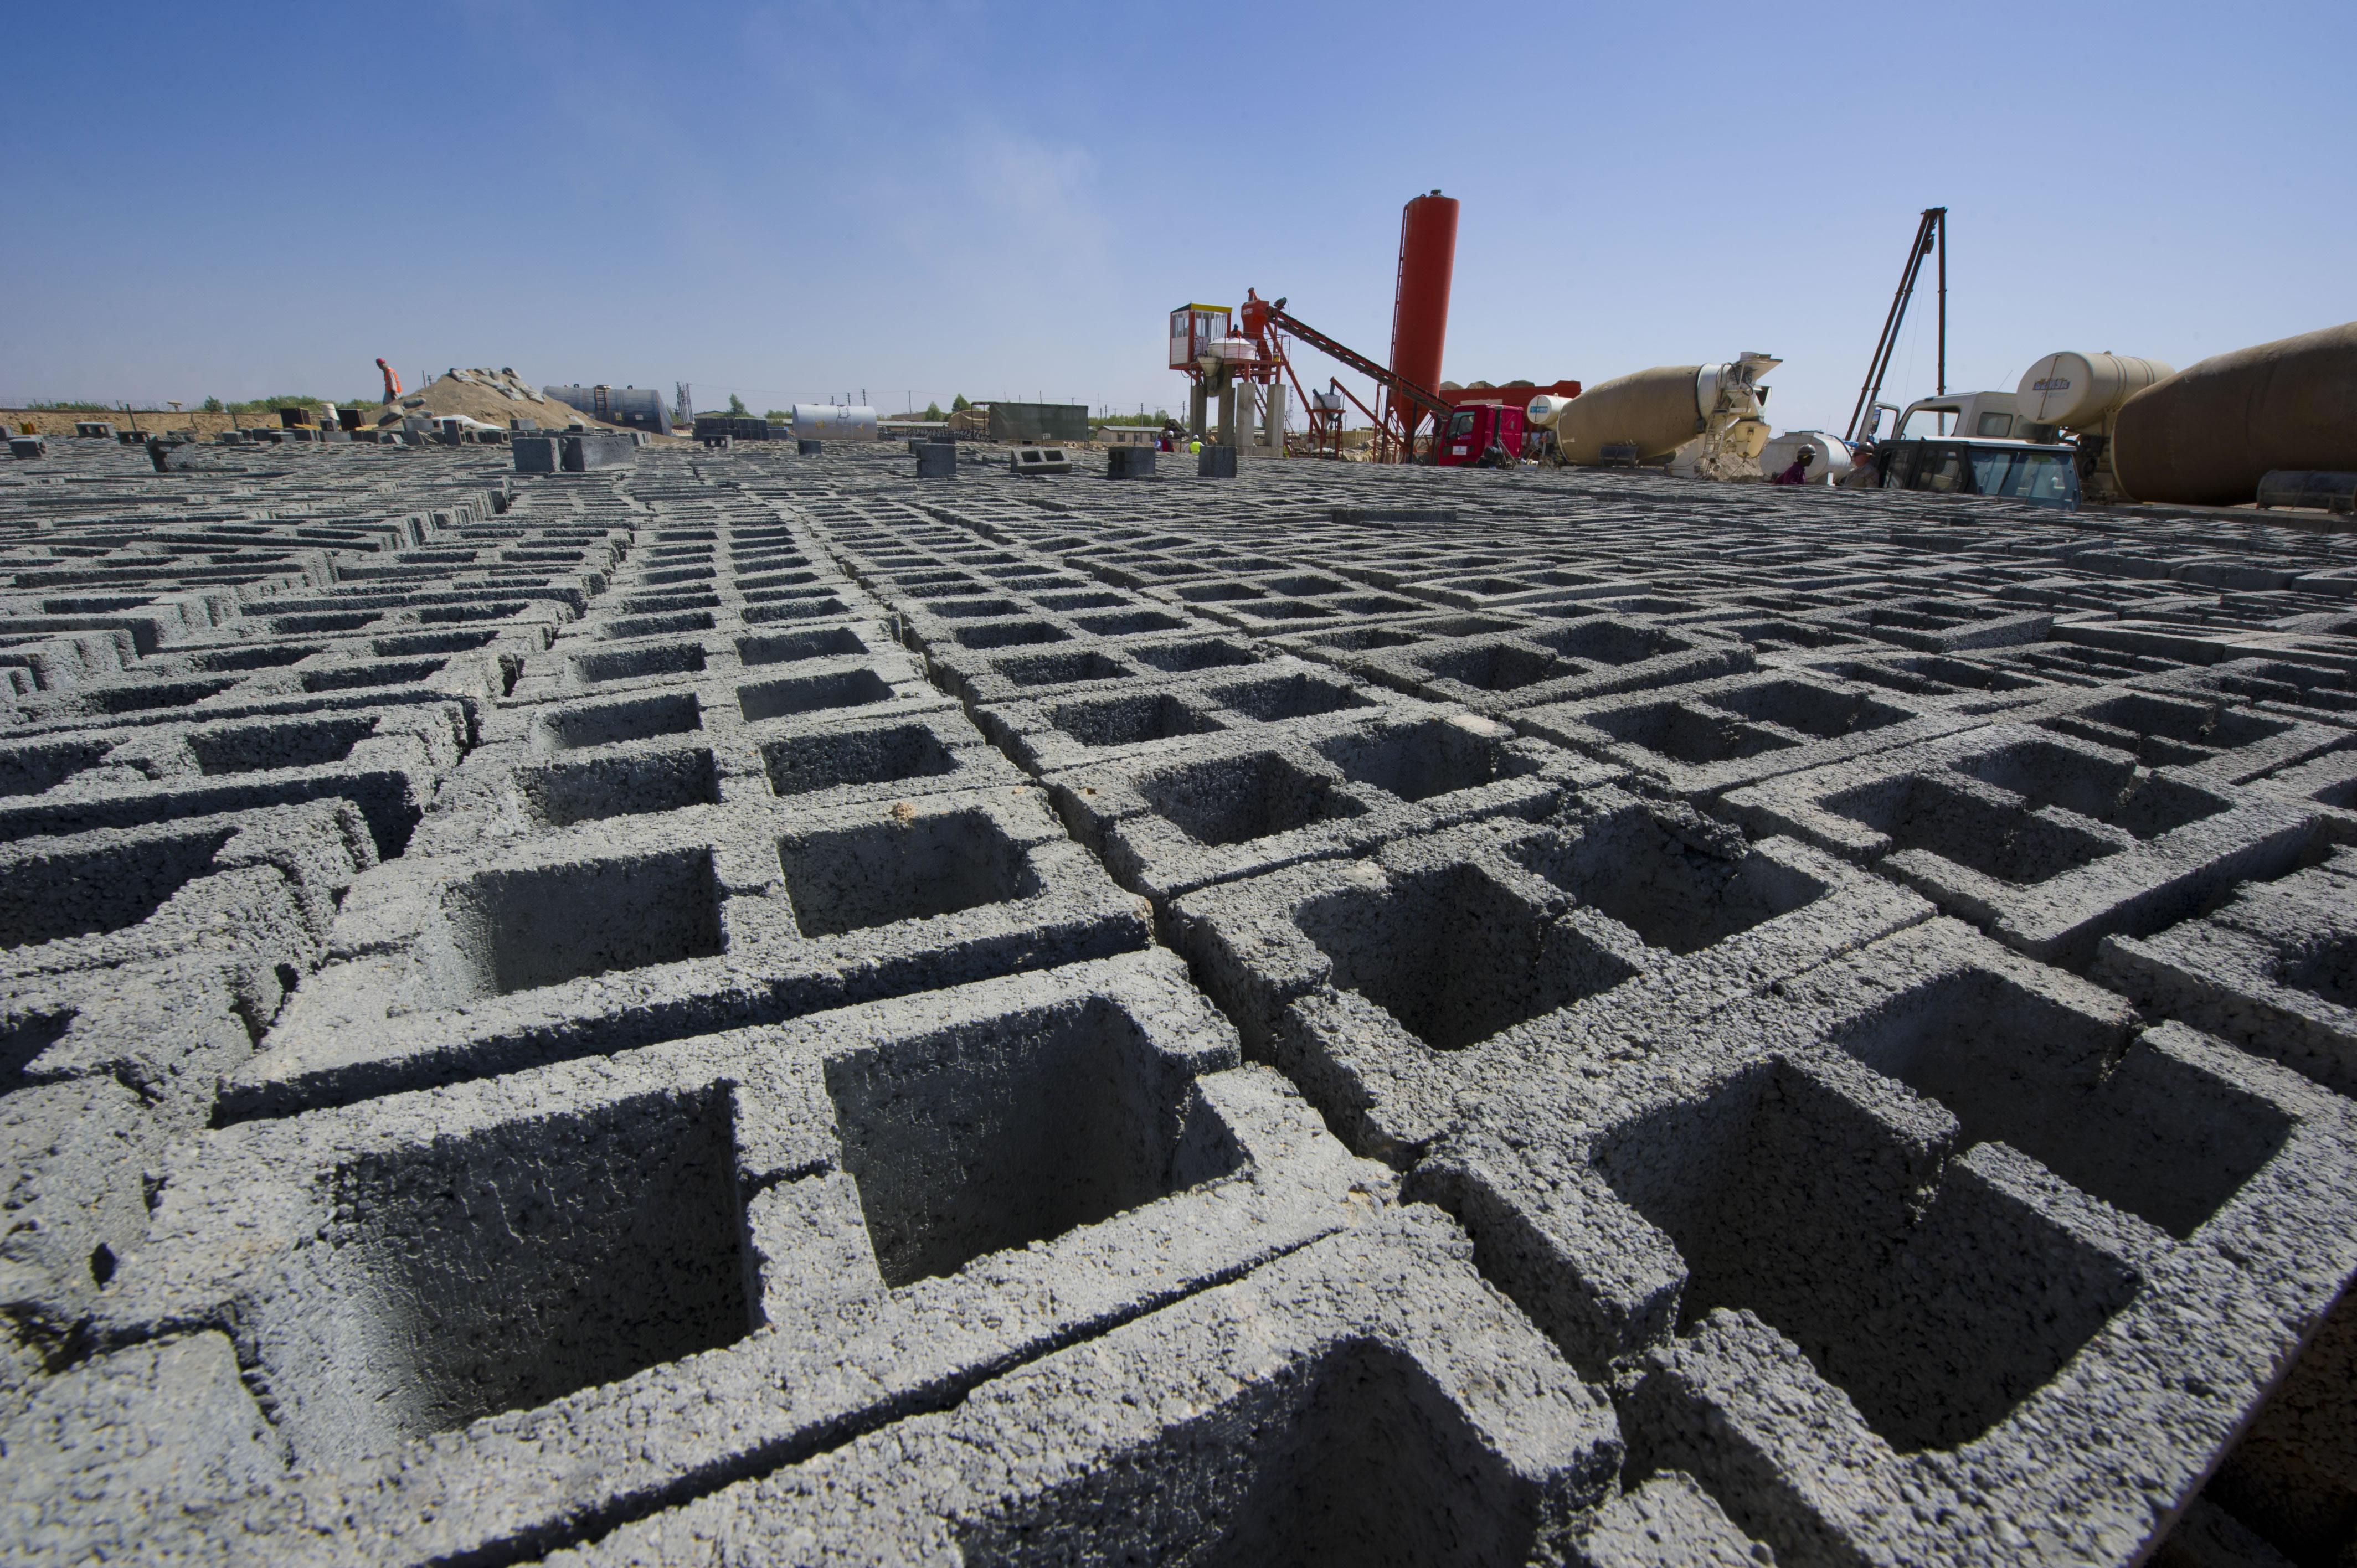 Concrete Masonry Unit : File concrete masonry units g wikimedia commons